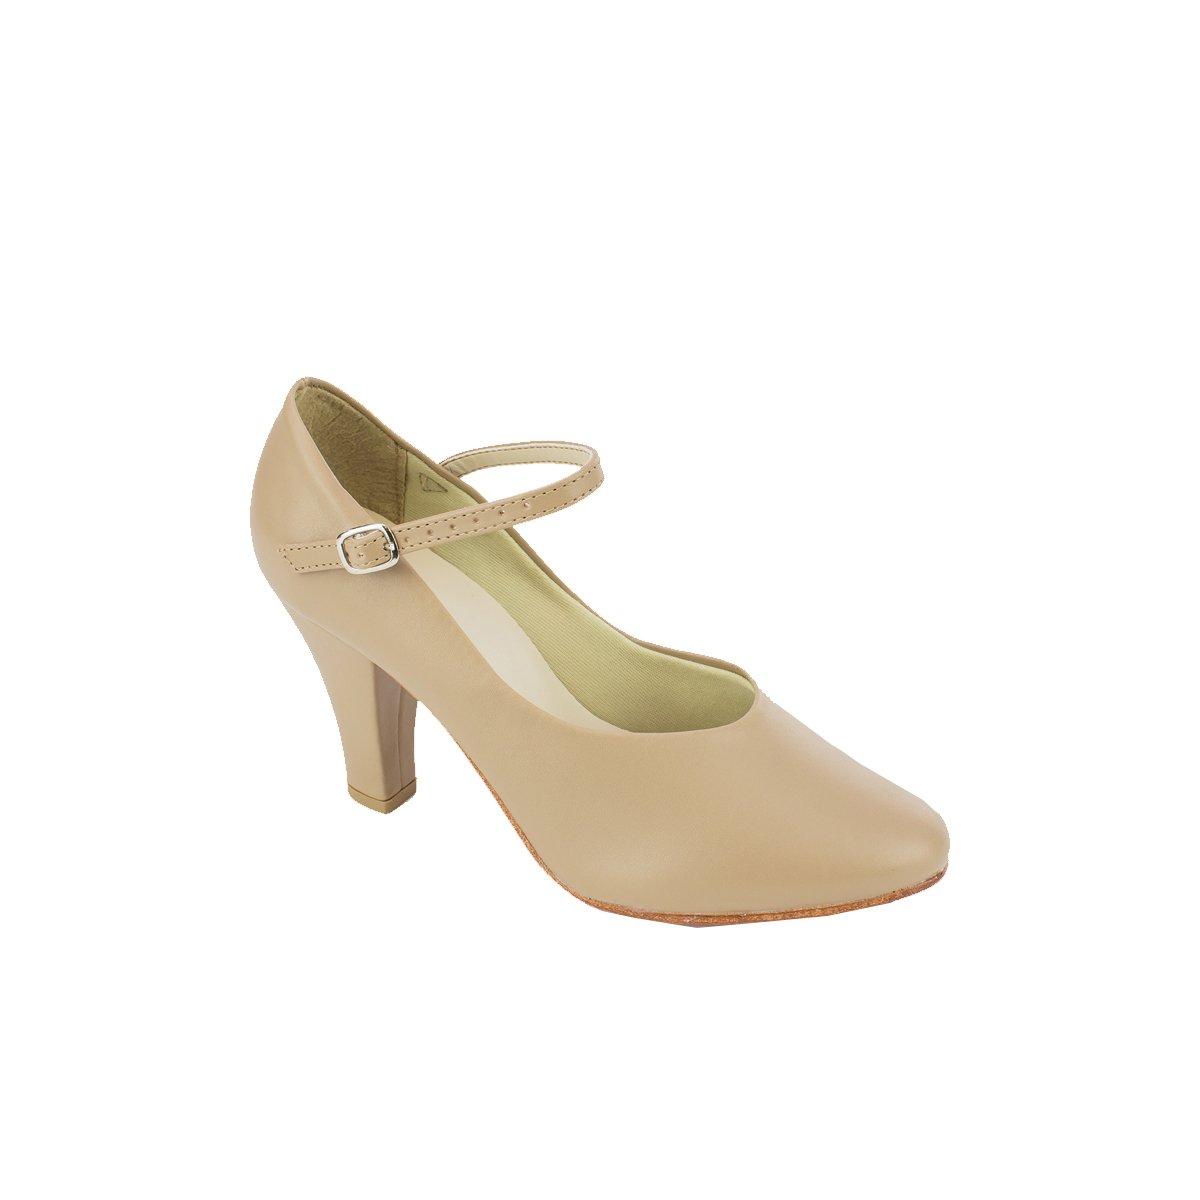 Sodanca Ch-53 Adult Chloe 3 Heel Character Shoe